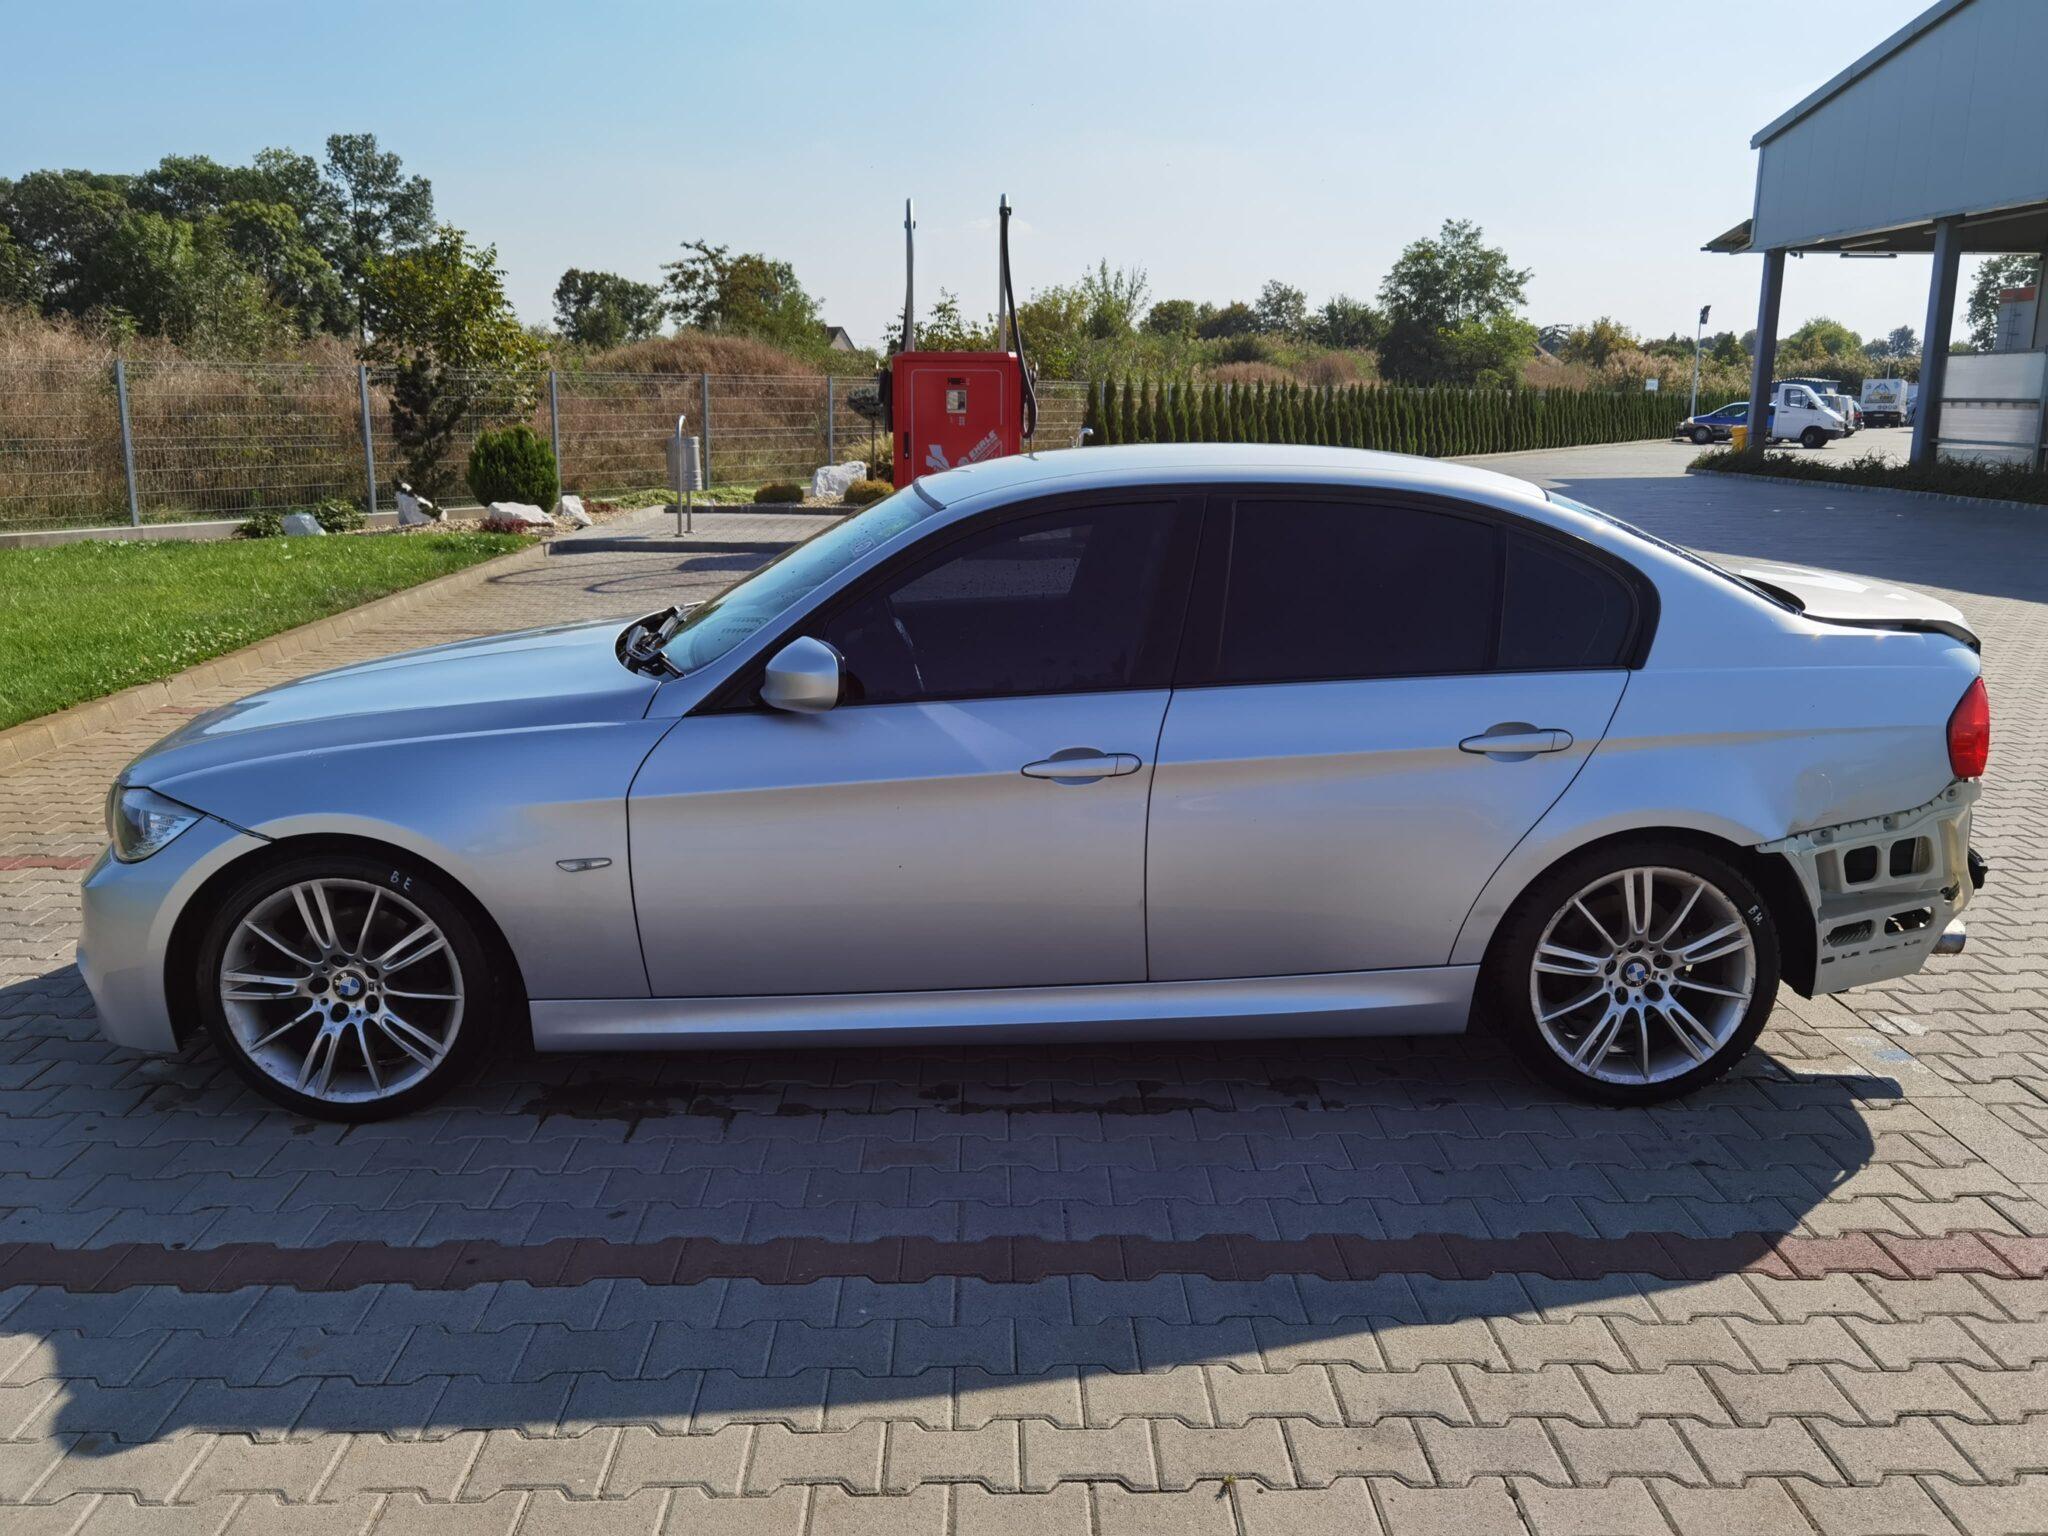 BMW E90 lci 318d Carbon Car Center Békéscsaba-5